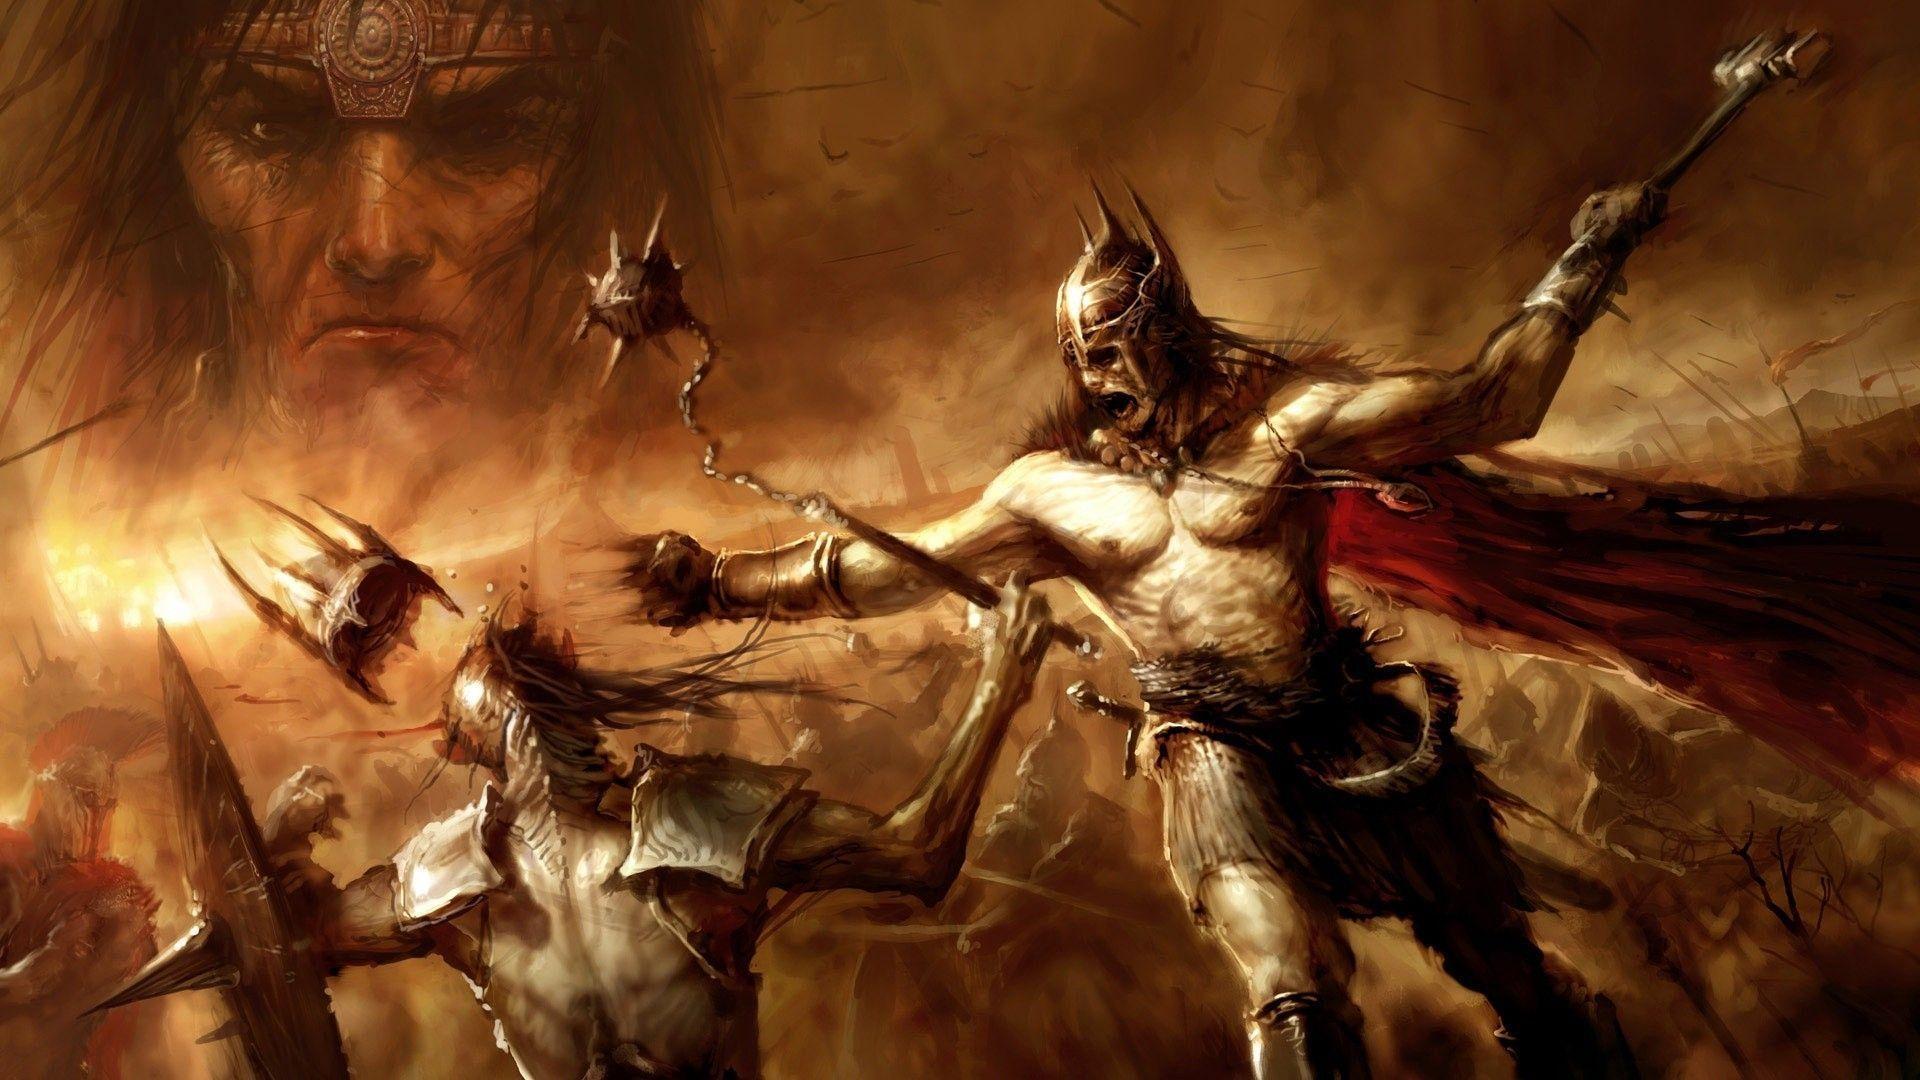 Age Of Conan Wallpaper